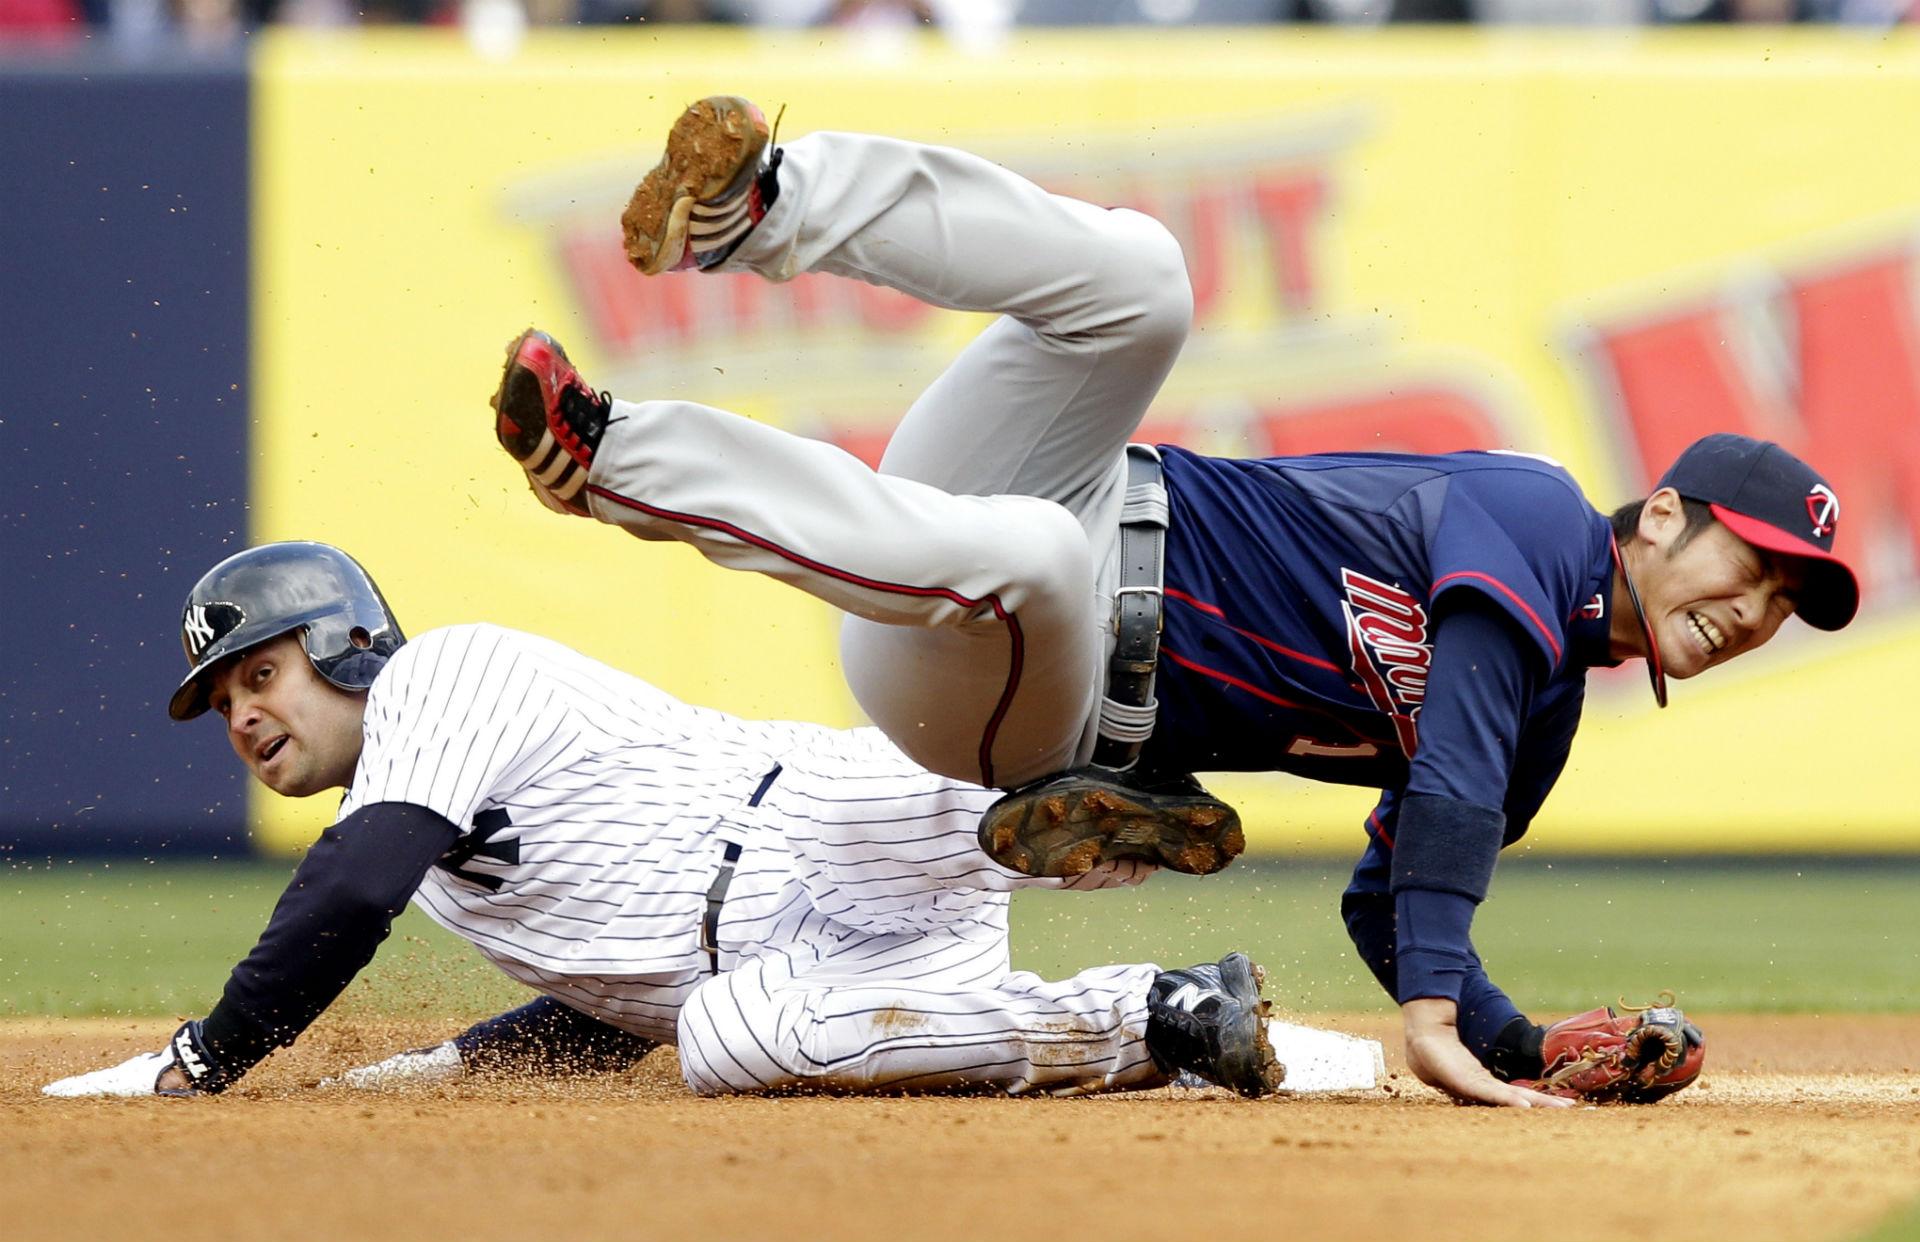 Yankees Iphone 7 Plus Wallpaper 2012 Mlb Playoffs Hd Wallpaper Background Image